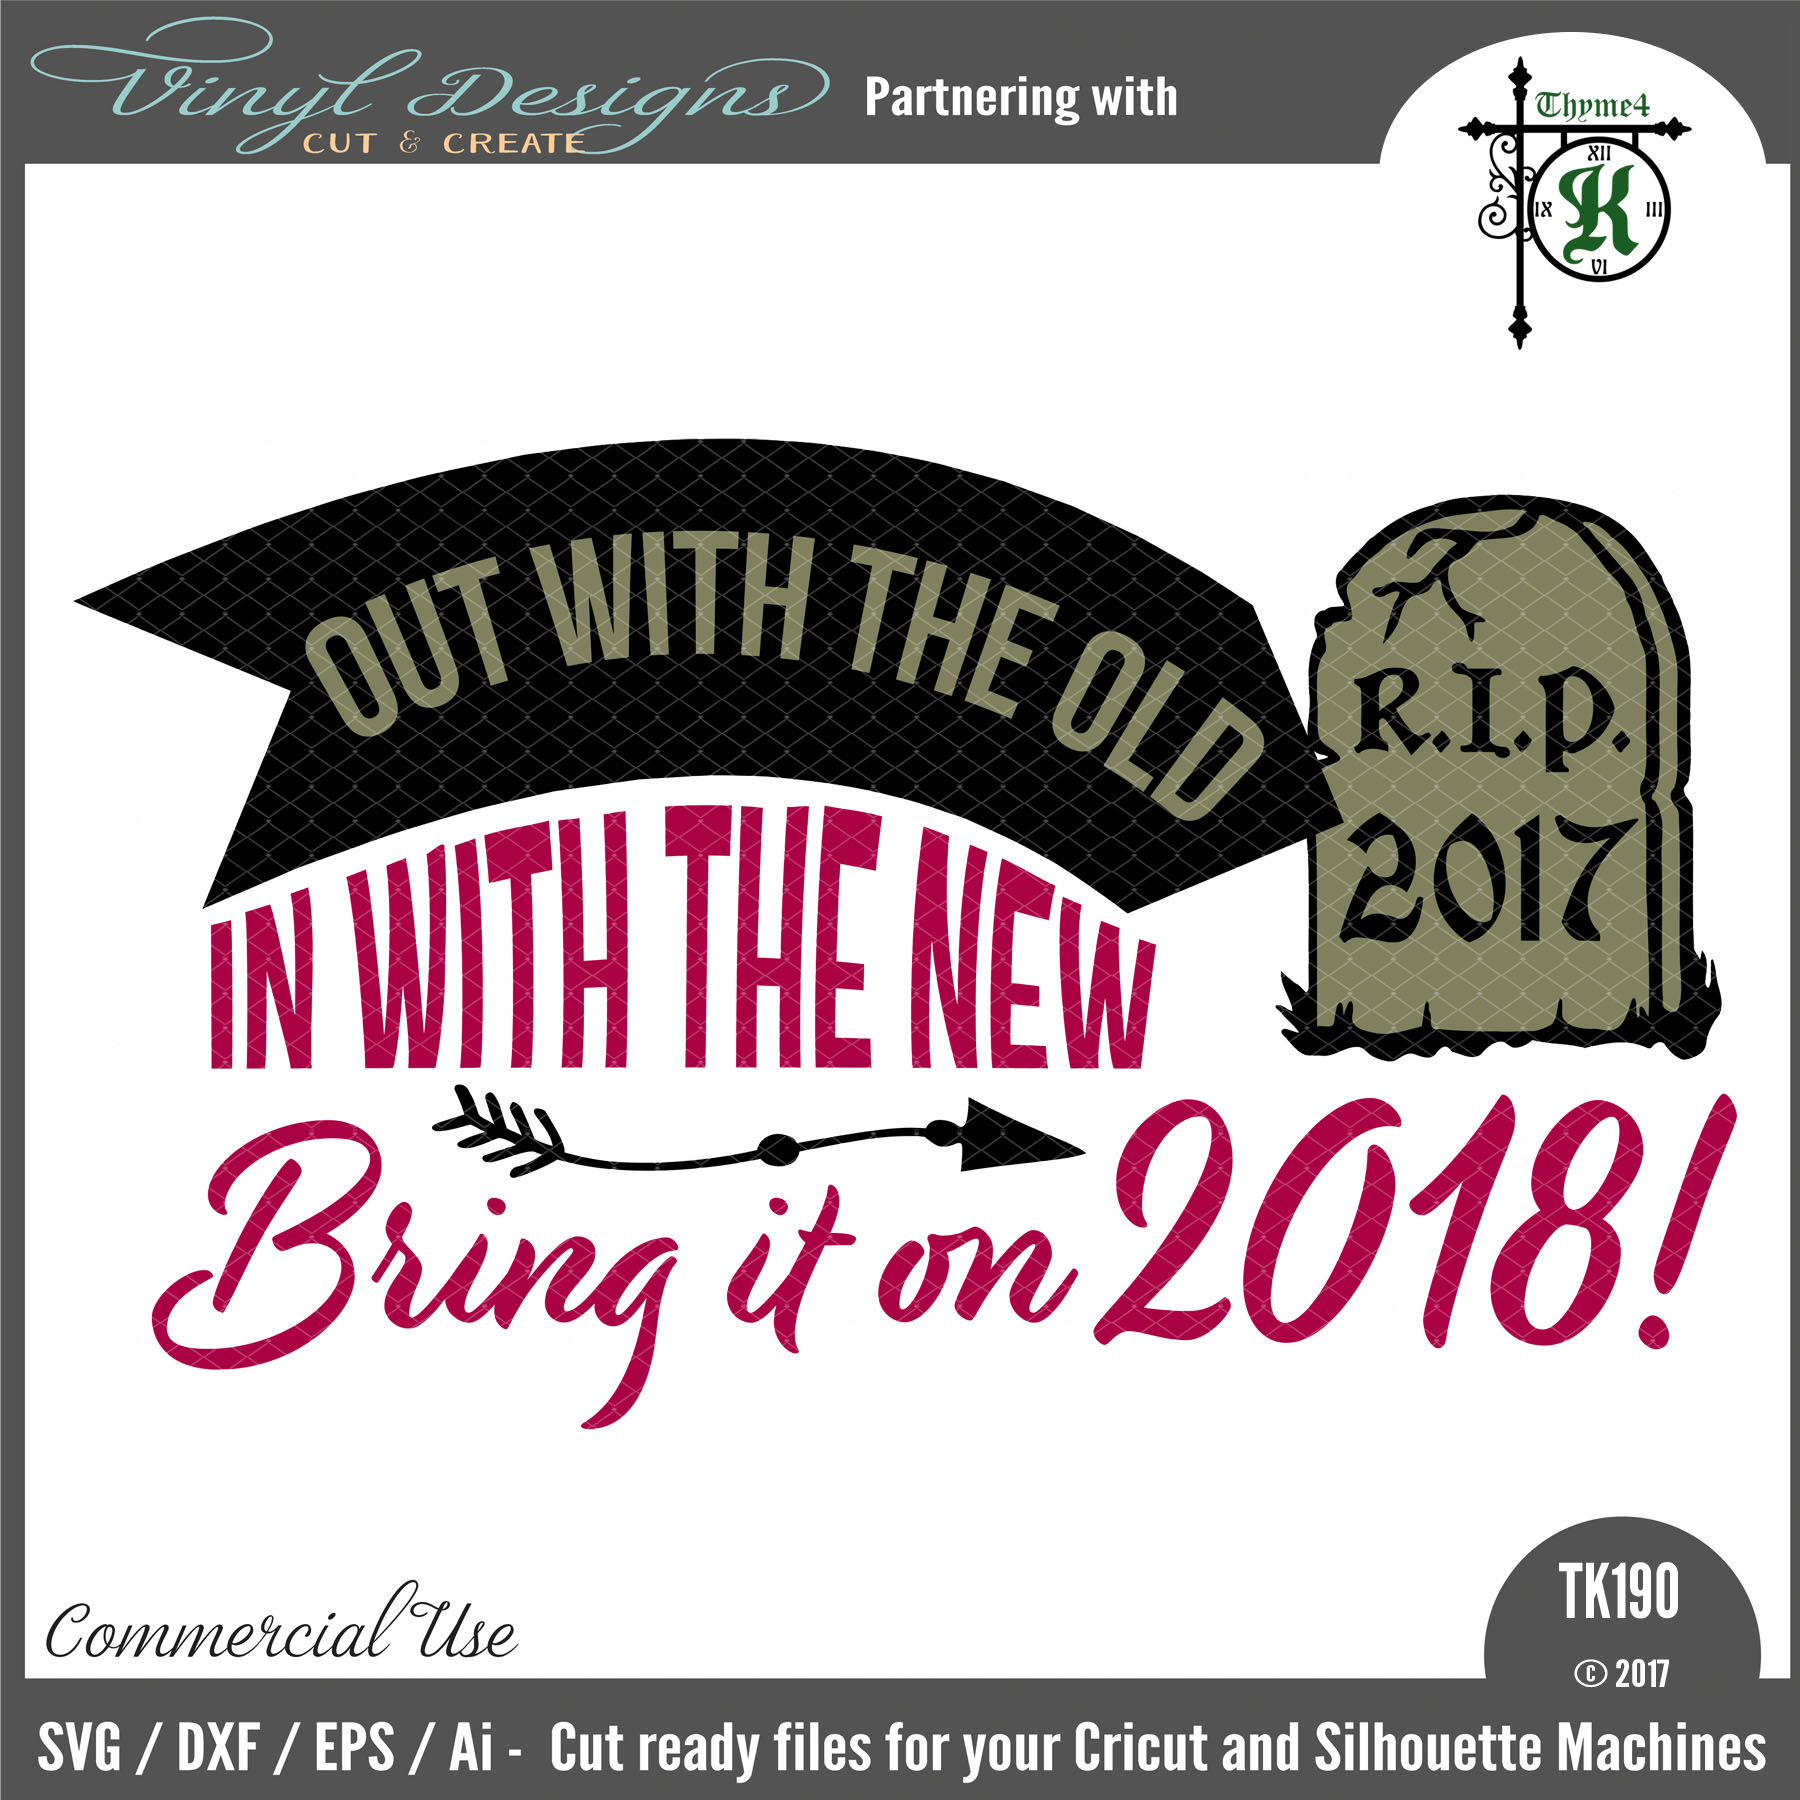 1800x1800 Tk190 R.i.p. 2017 Bring It On 2018 Vinyl Designs Cut And Create